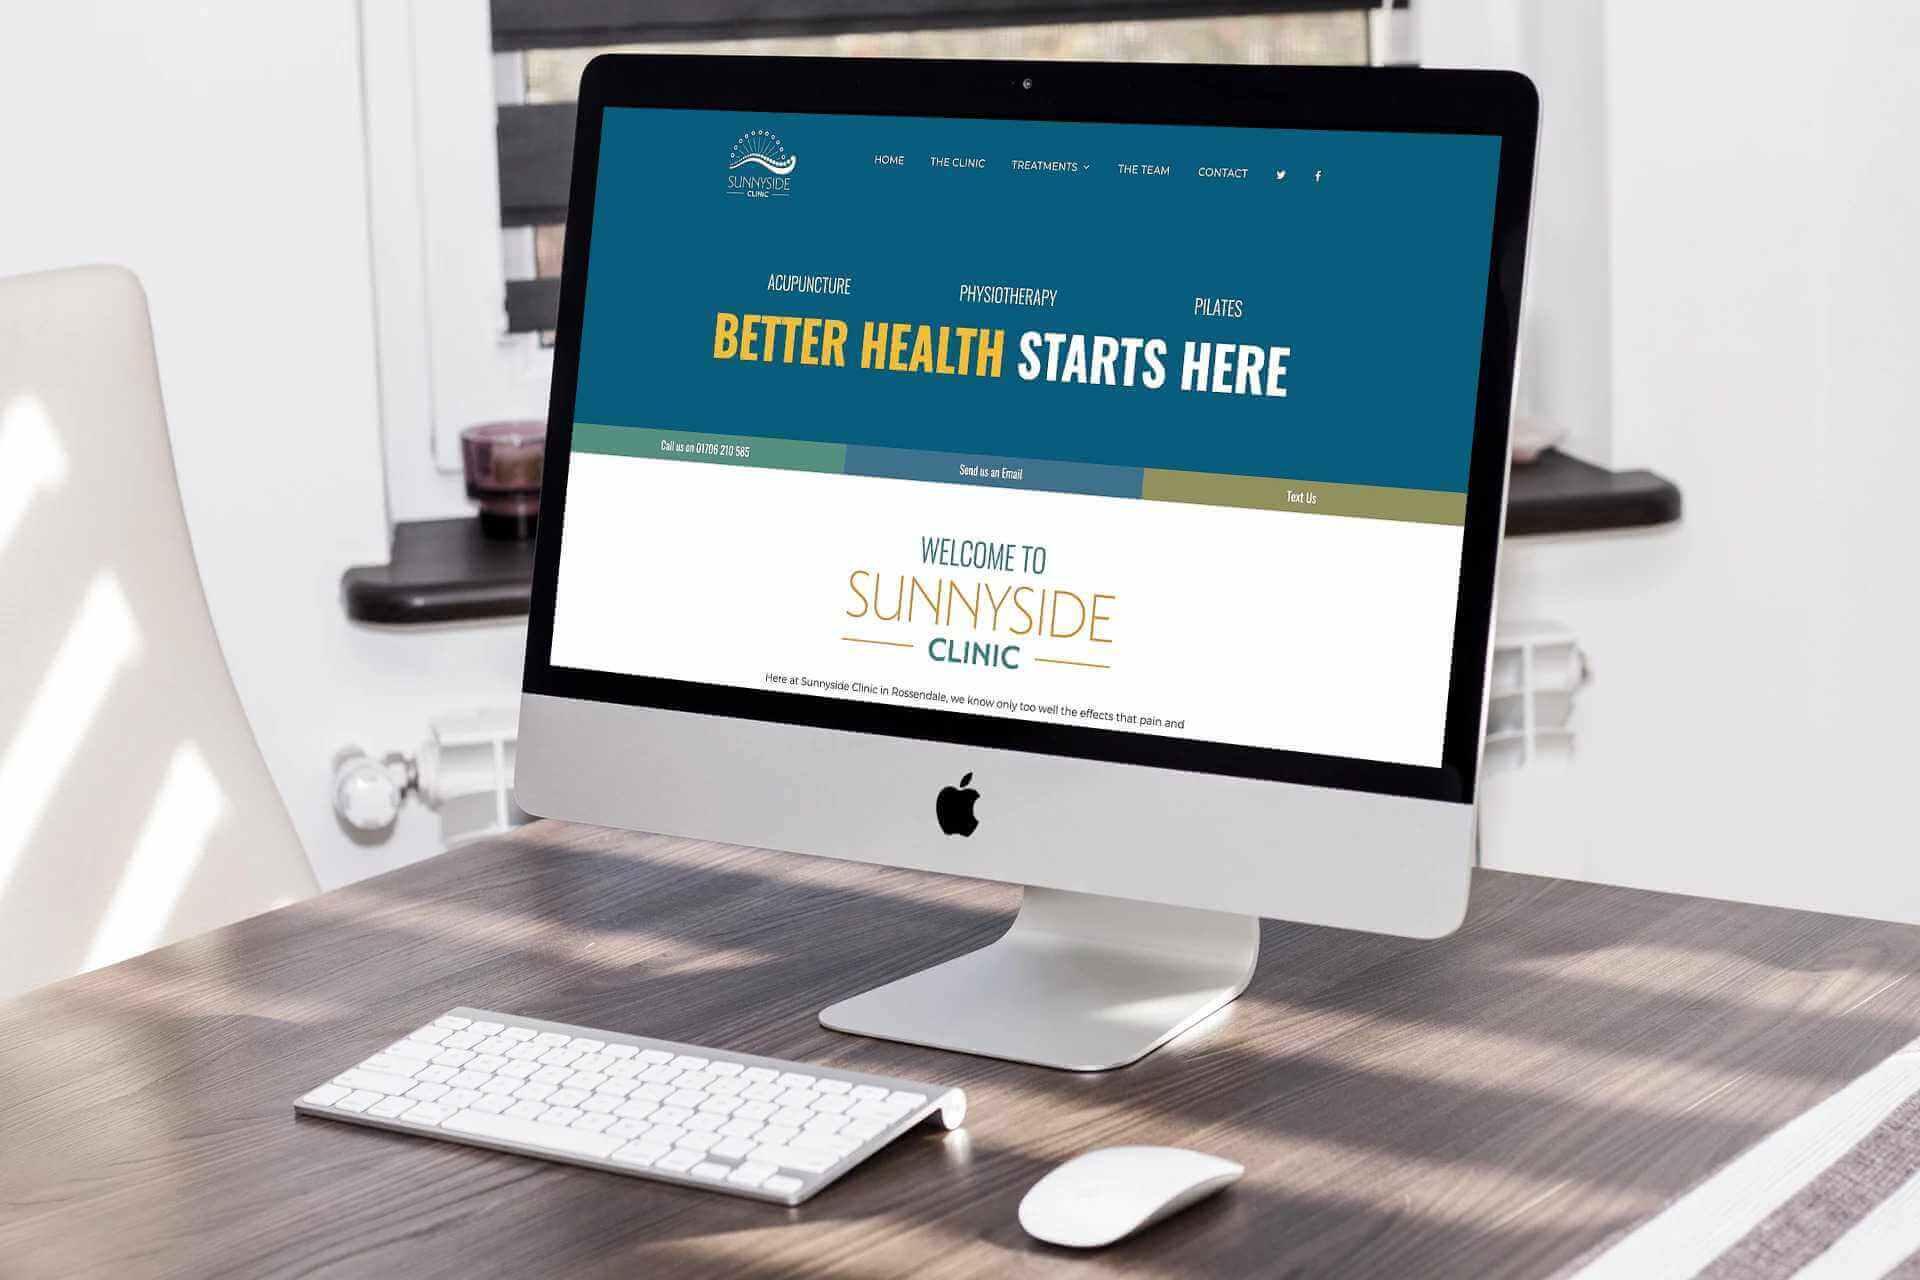 Sunnyside Clinic Apple iMac mockup image